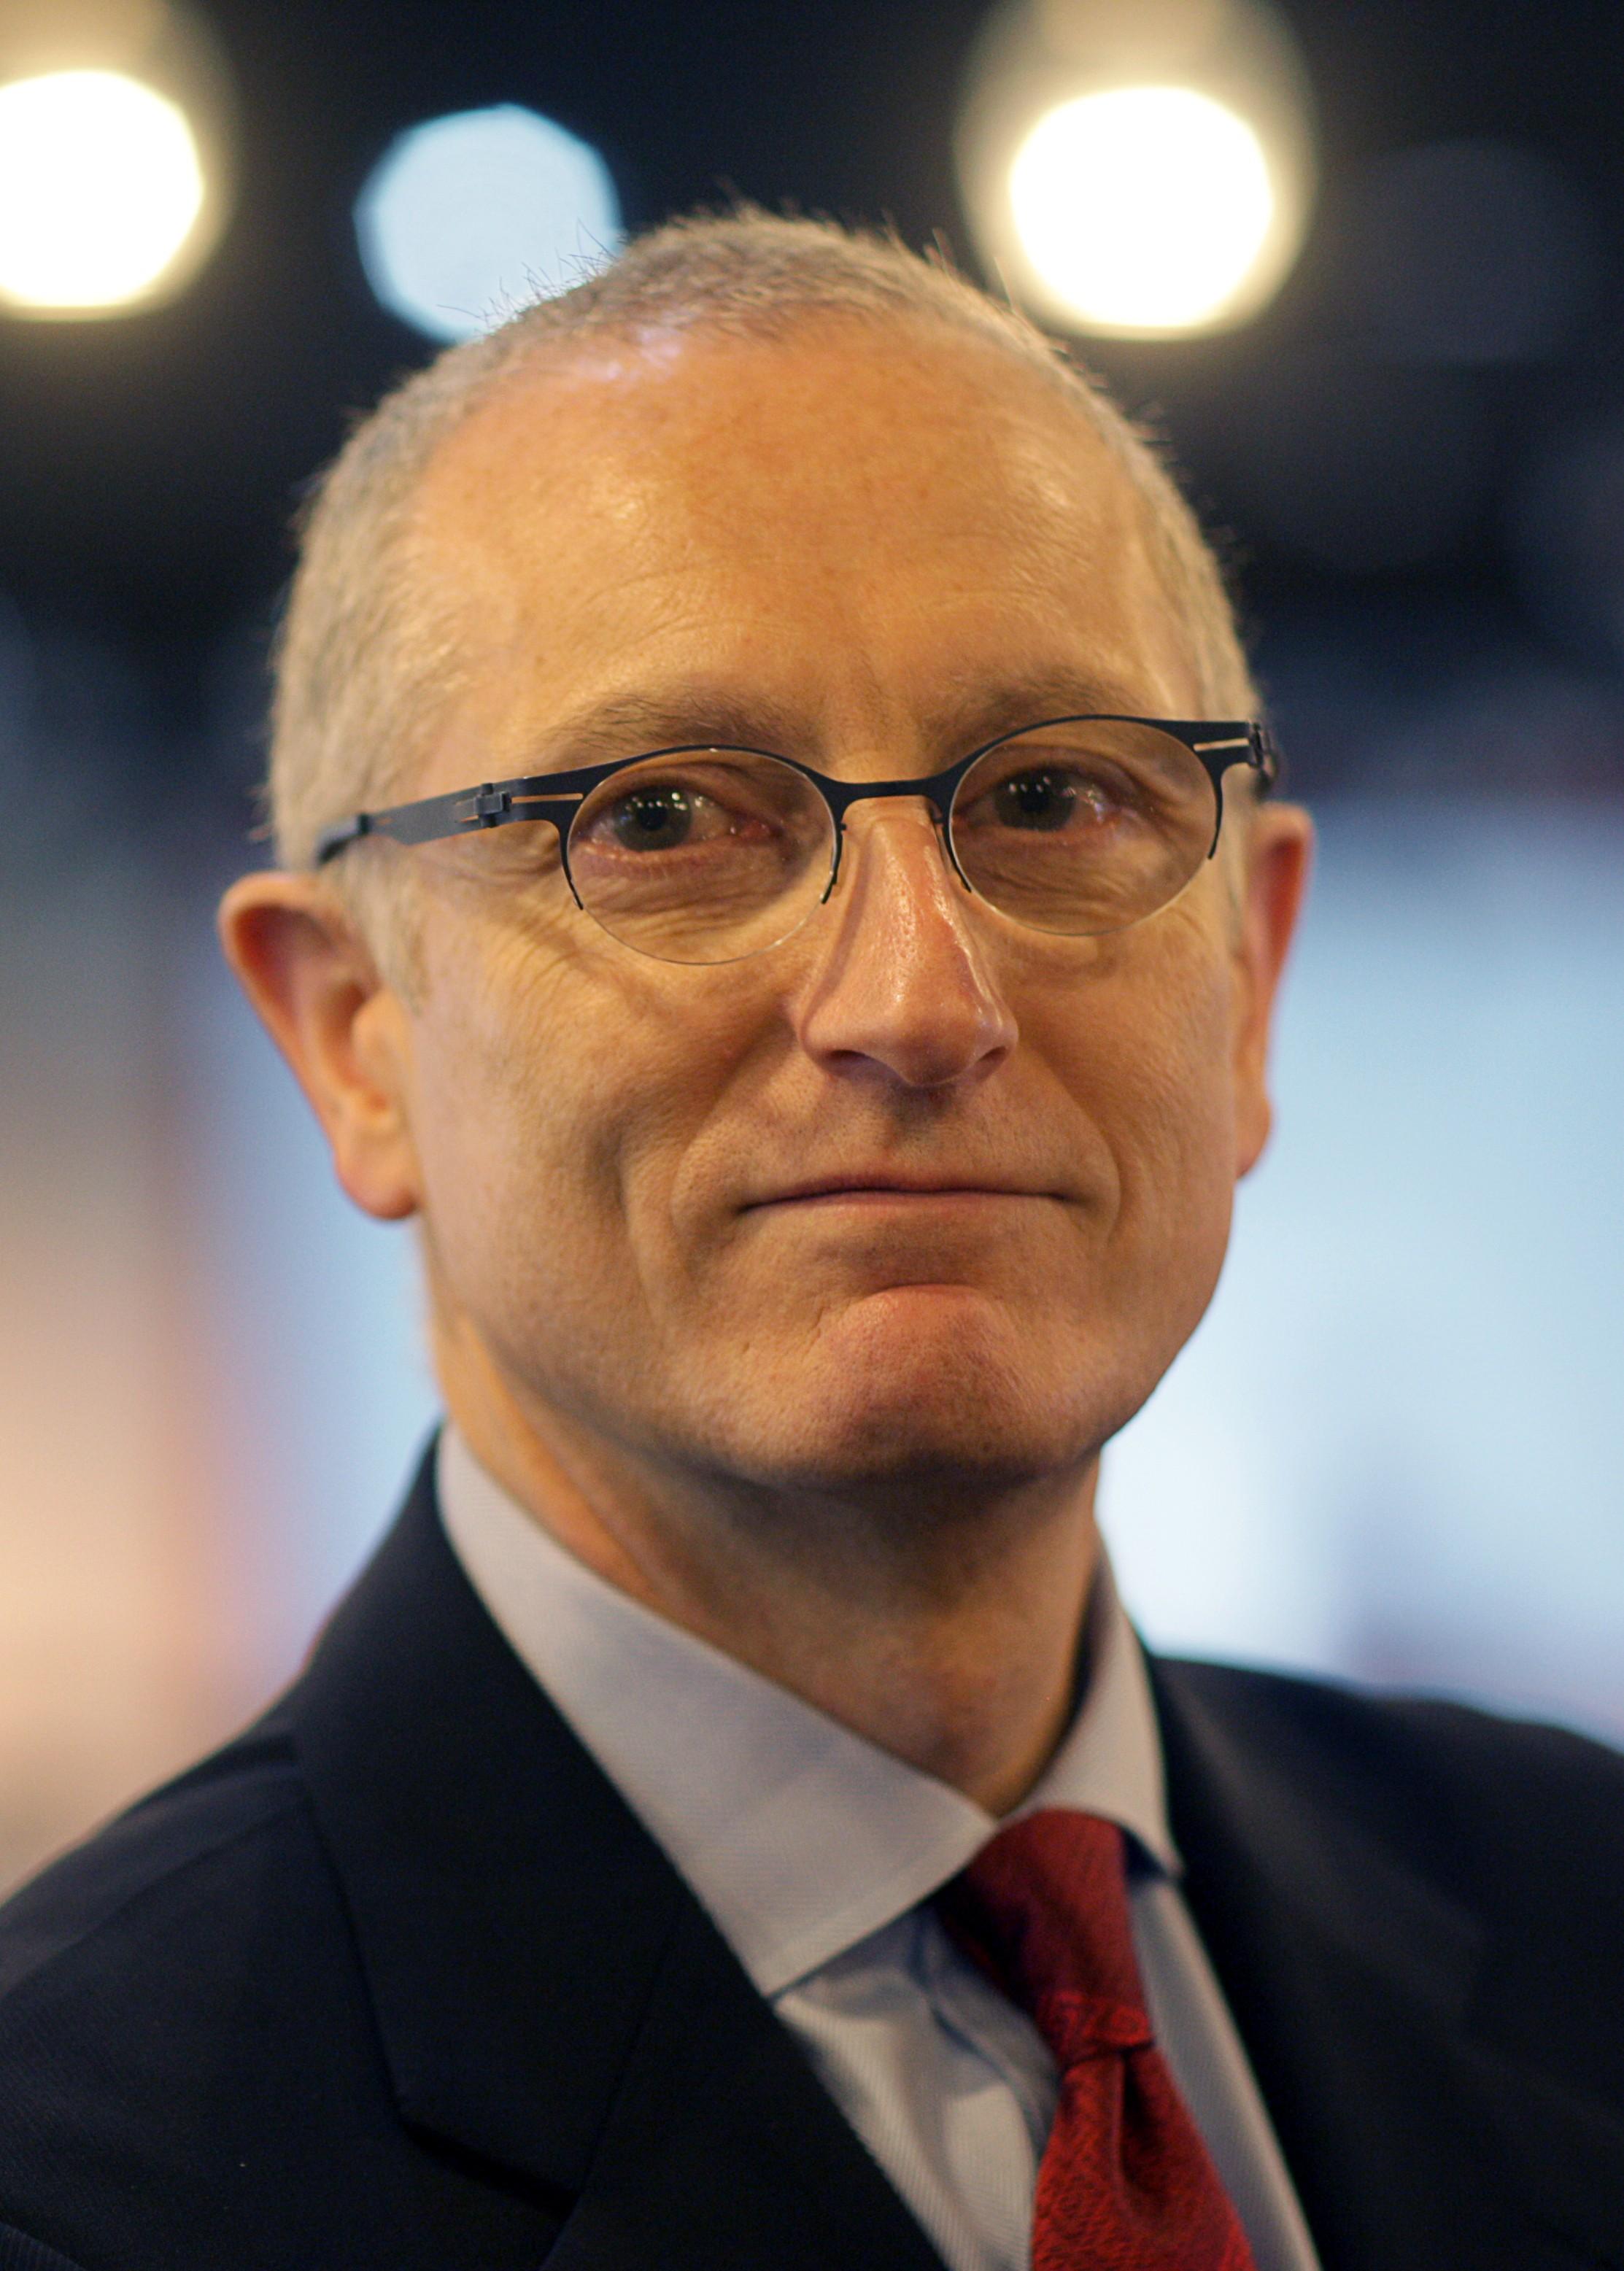 Laurent Philonenko, VP de inovação da Avaya (Foto: Divulgação/Avaya)